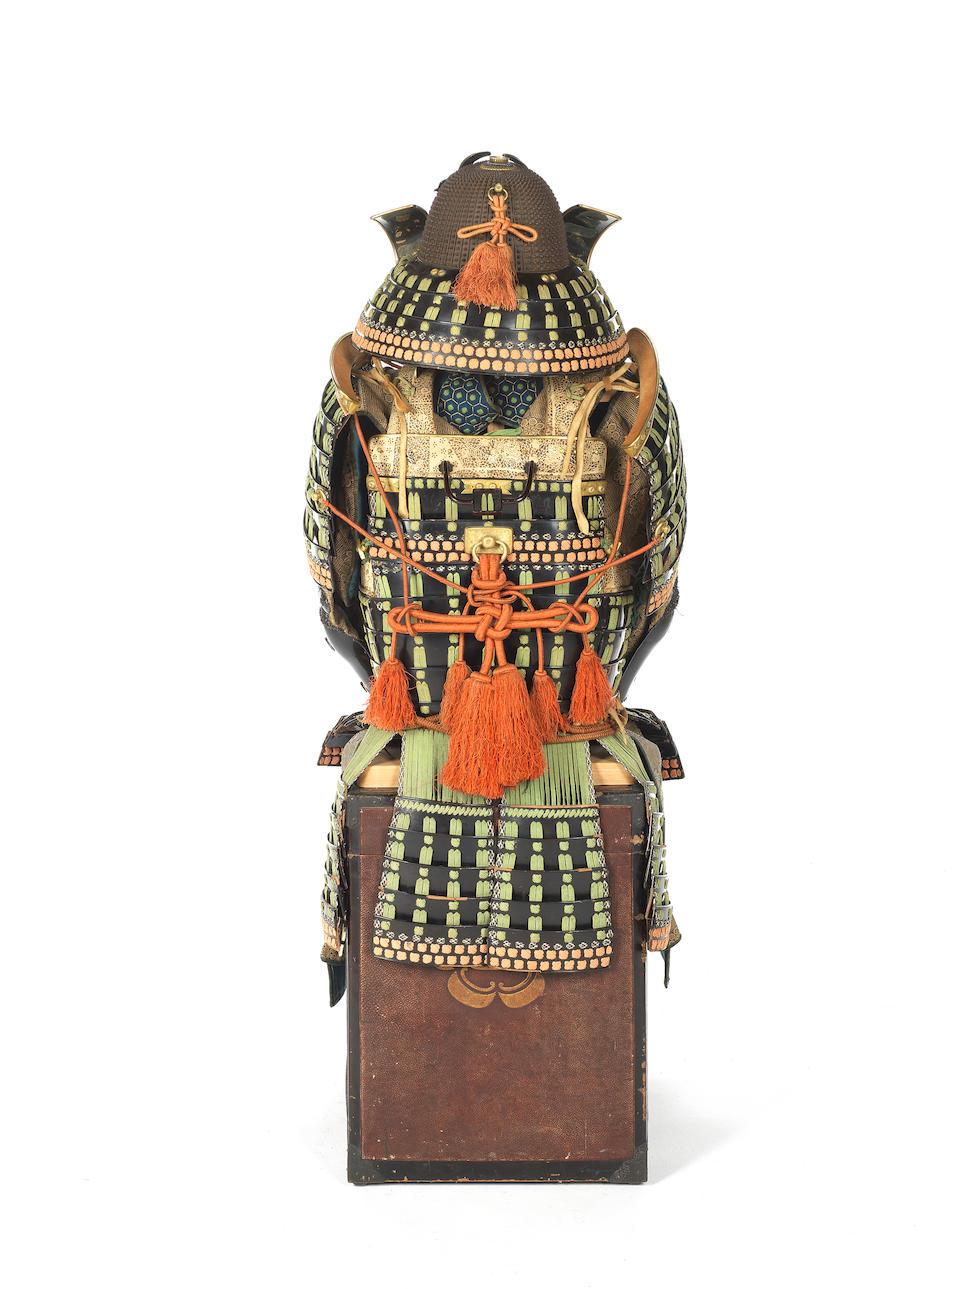 A mogami do tosei gusoku armour Edo Period, 18th/19th century, the helmet signed by Joshu ju Saotome Ienao, Momoyama Period, 16th century